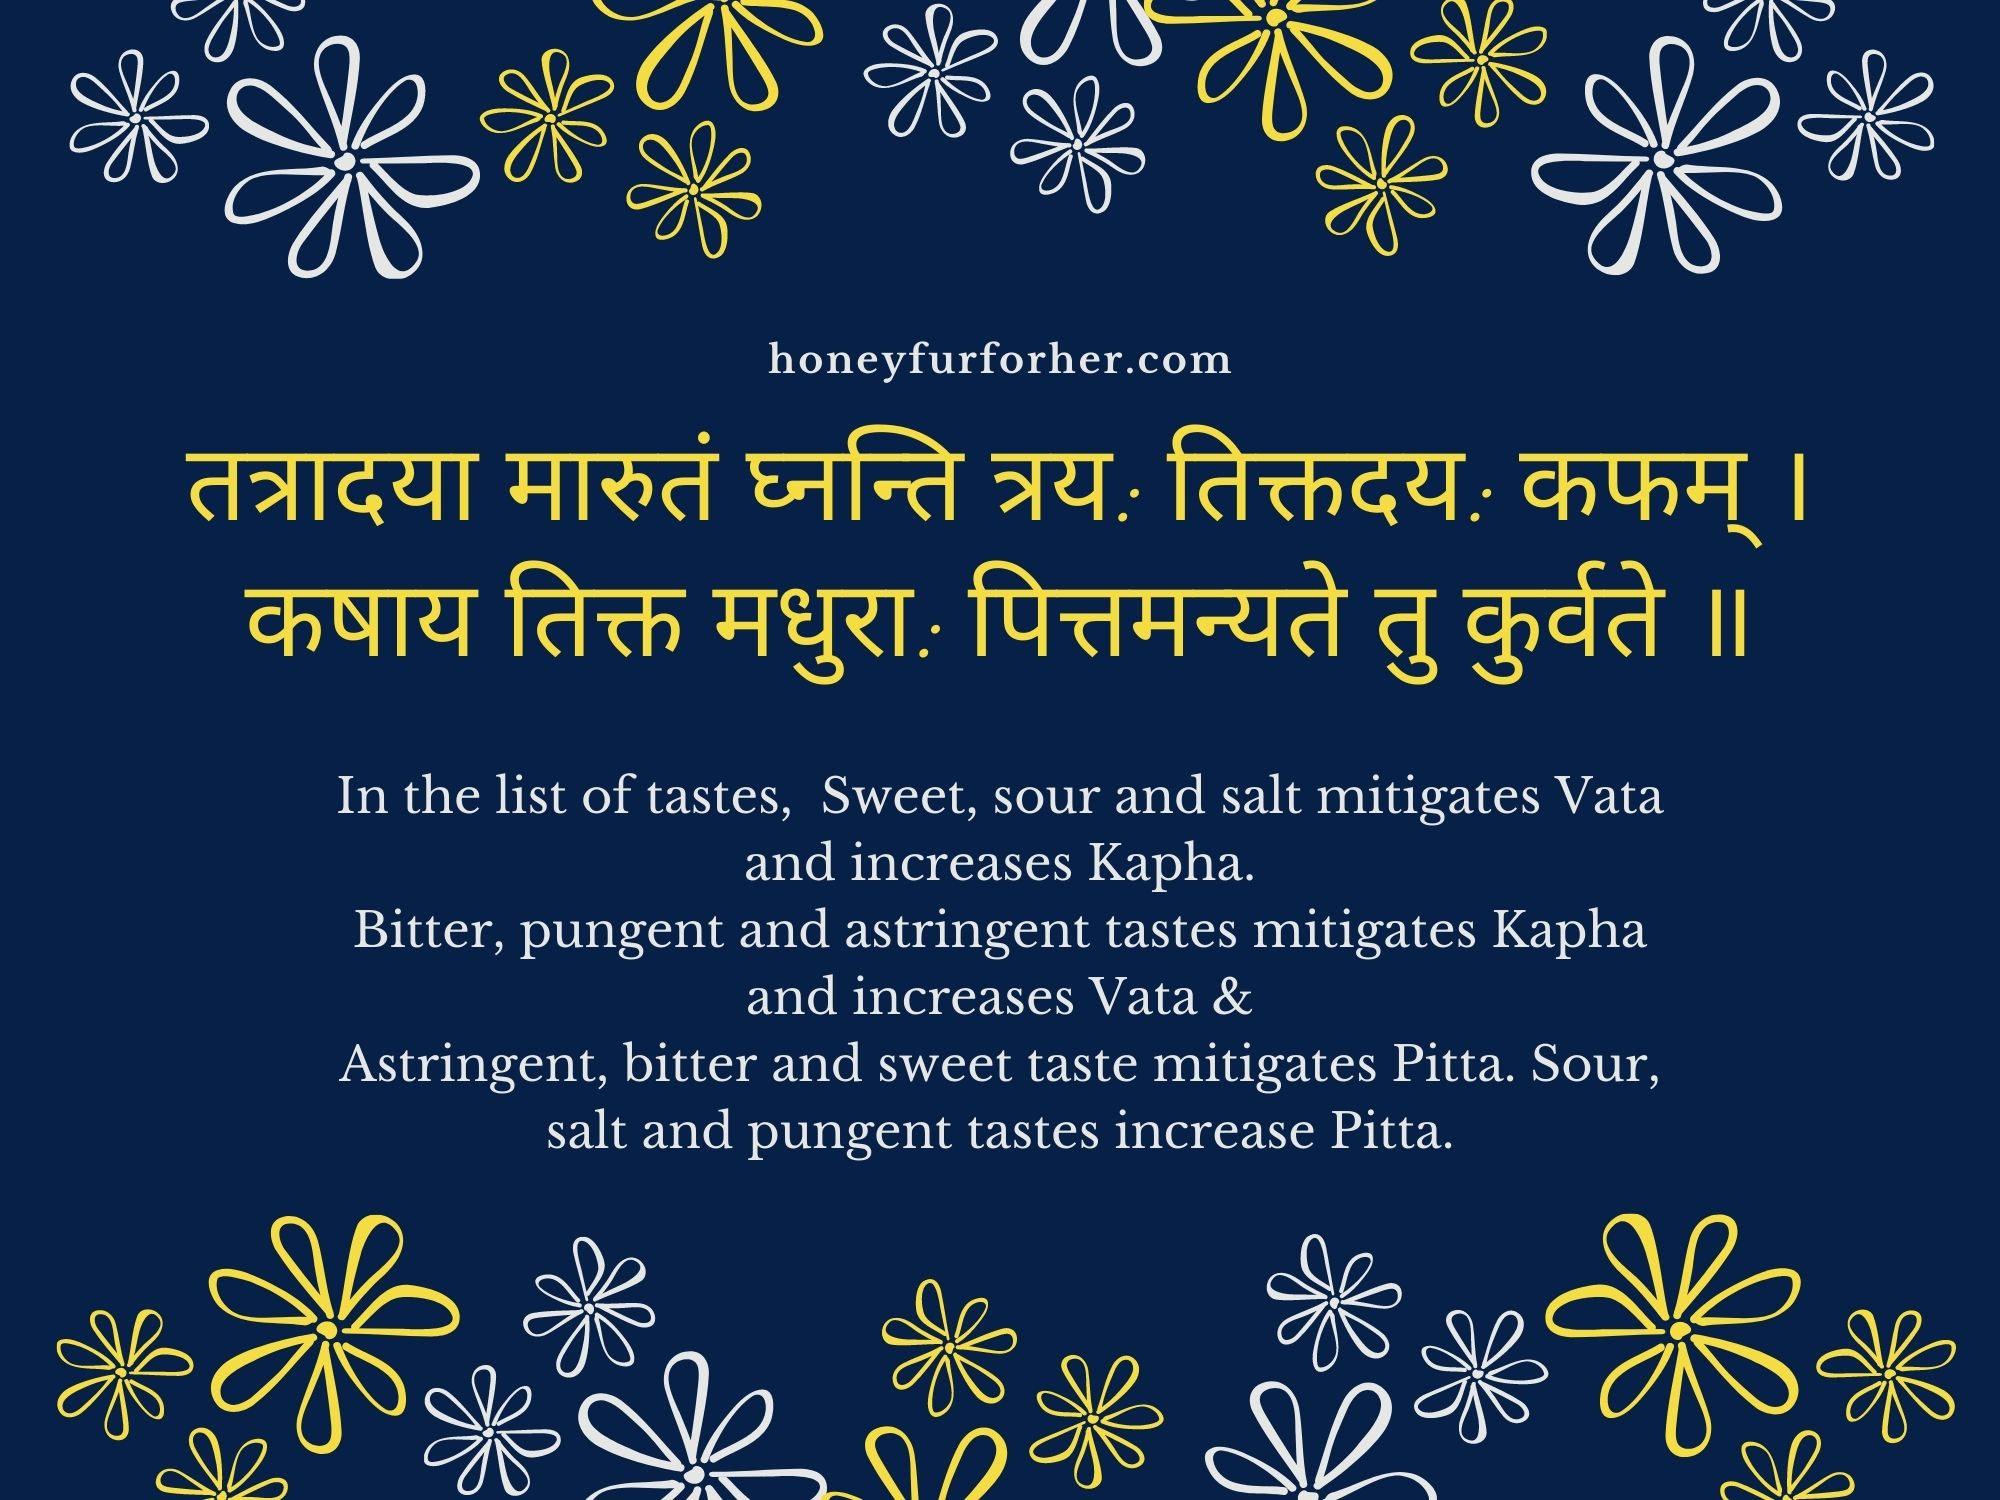 Ayurveda Quotes - Tastes For Vata Pitta Kapha